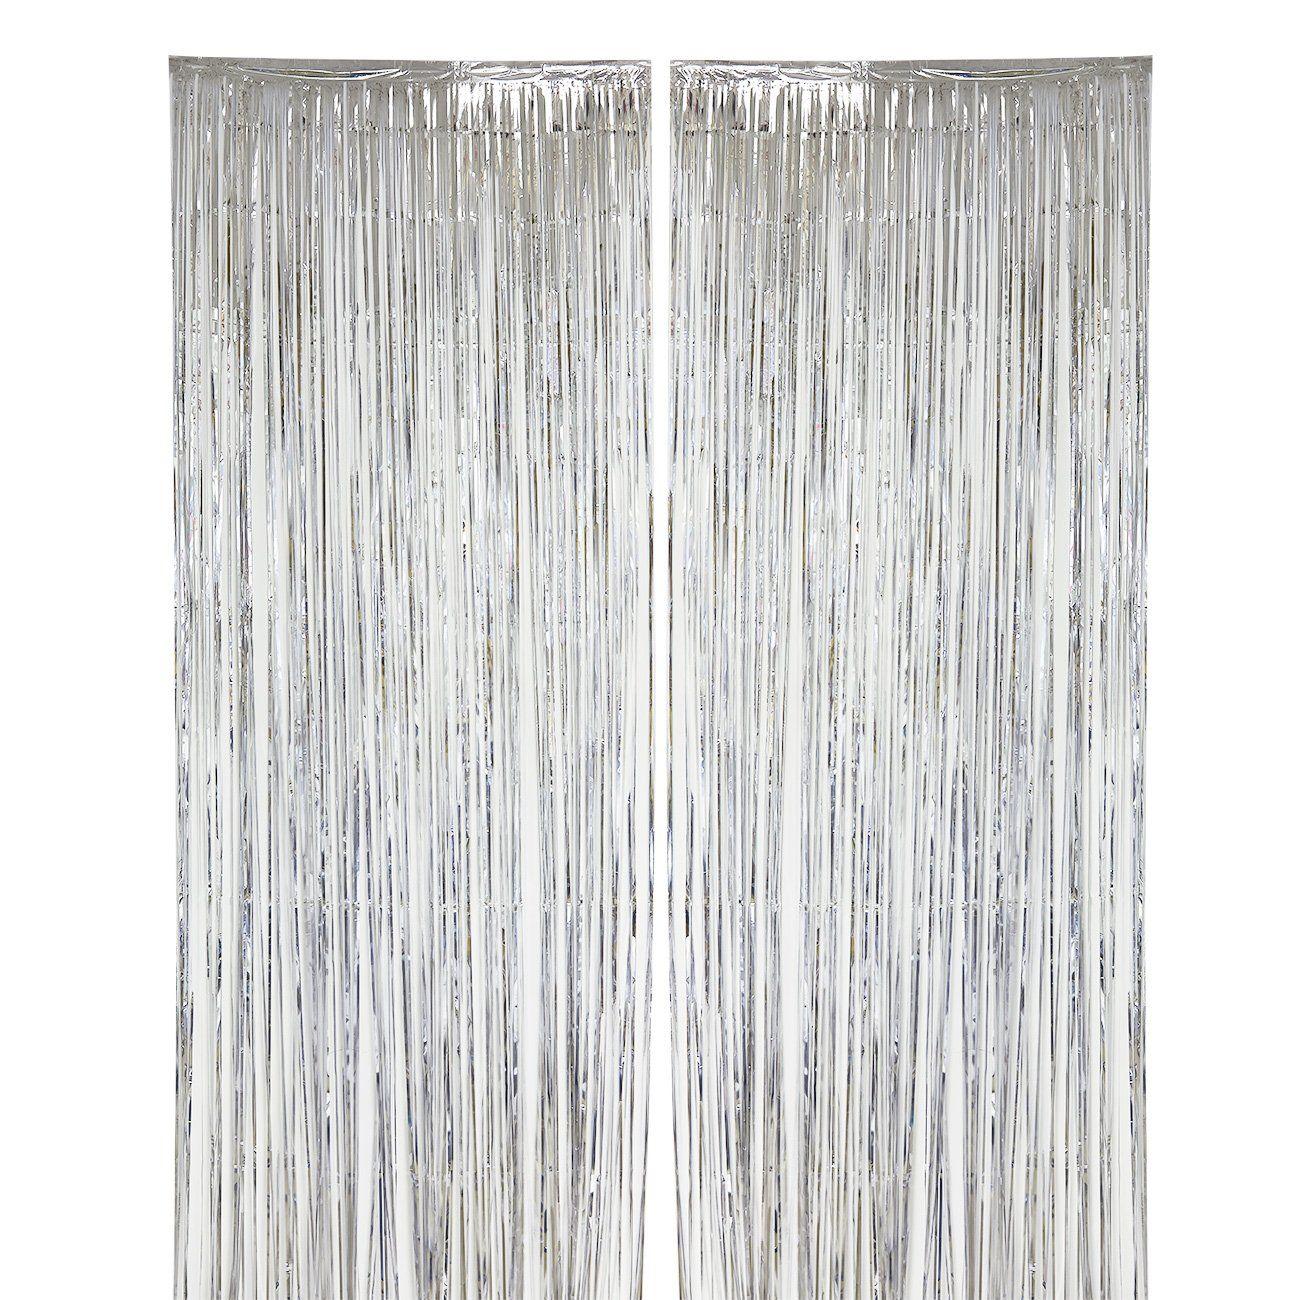 2pack Silver Fringe Curtains Wedding Photo Backdrop Metallic